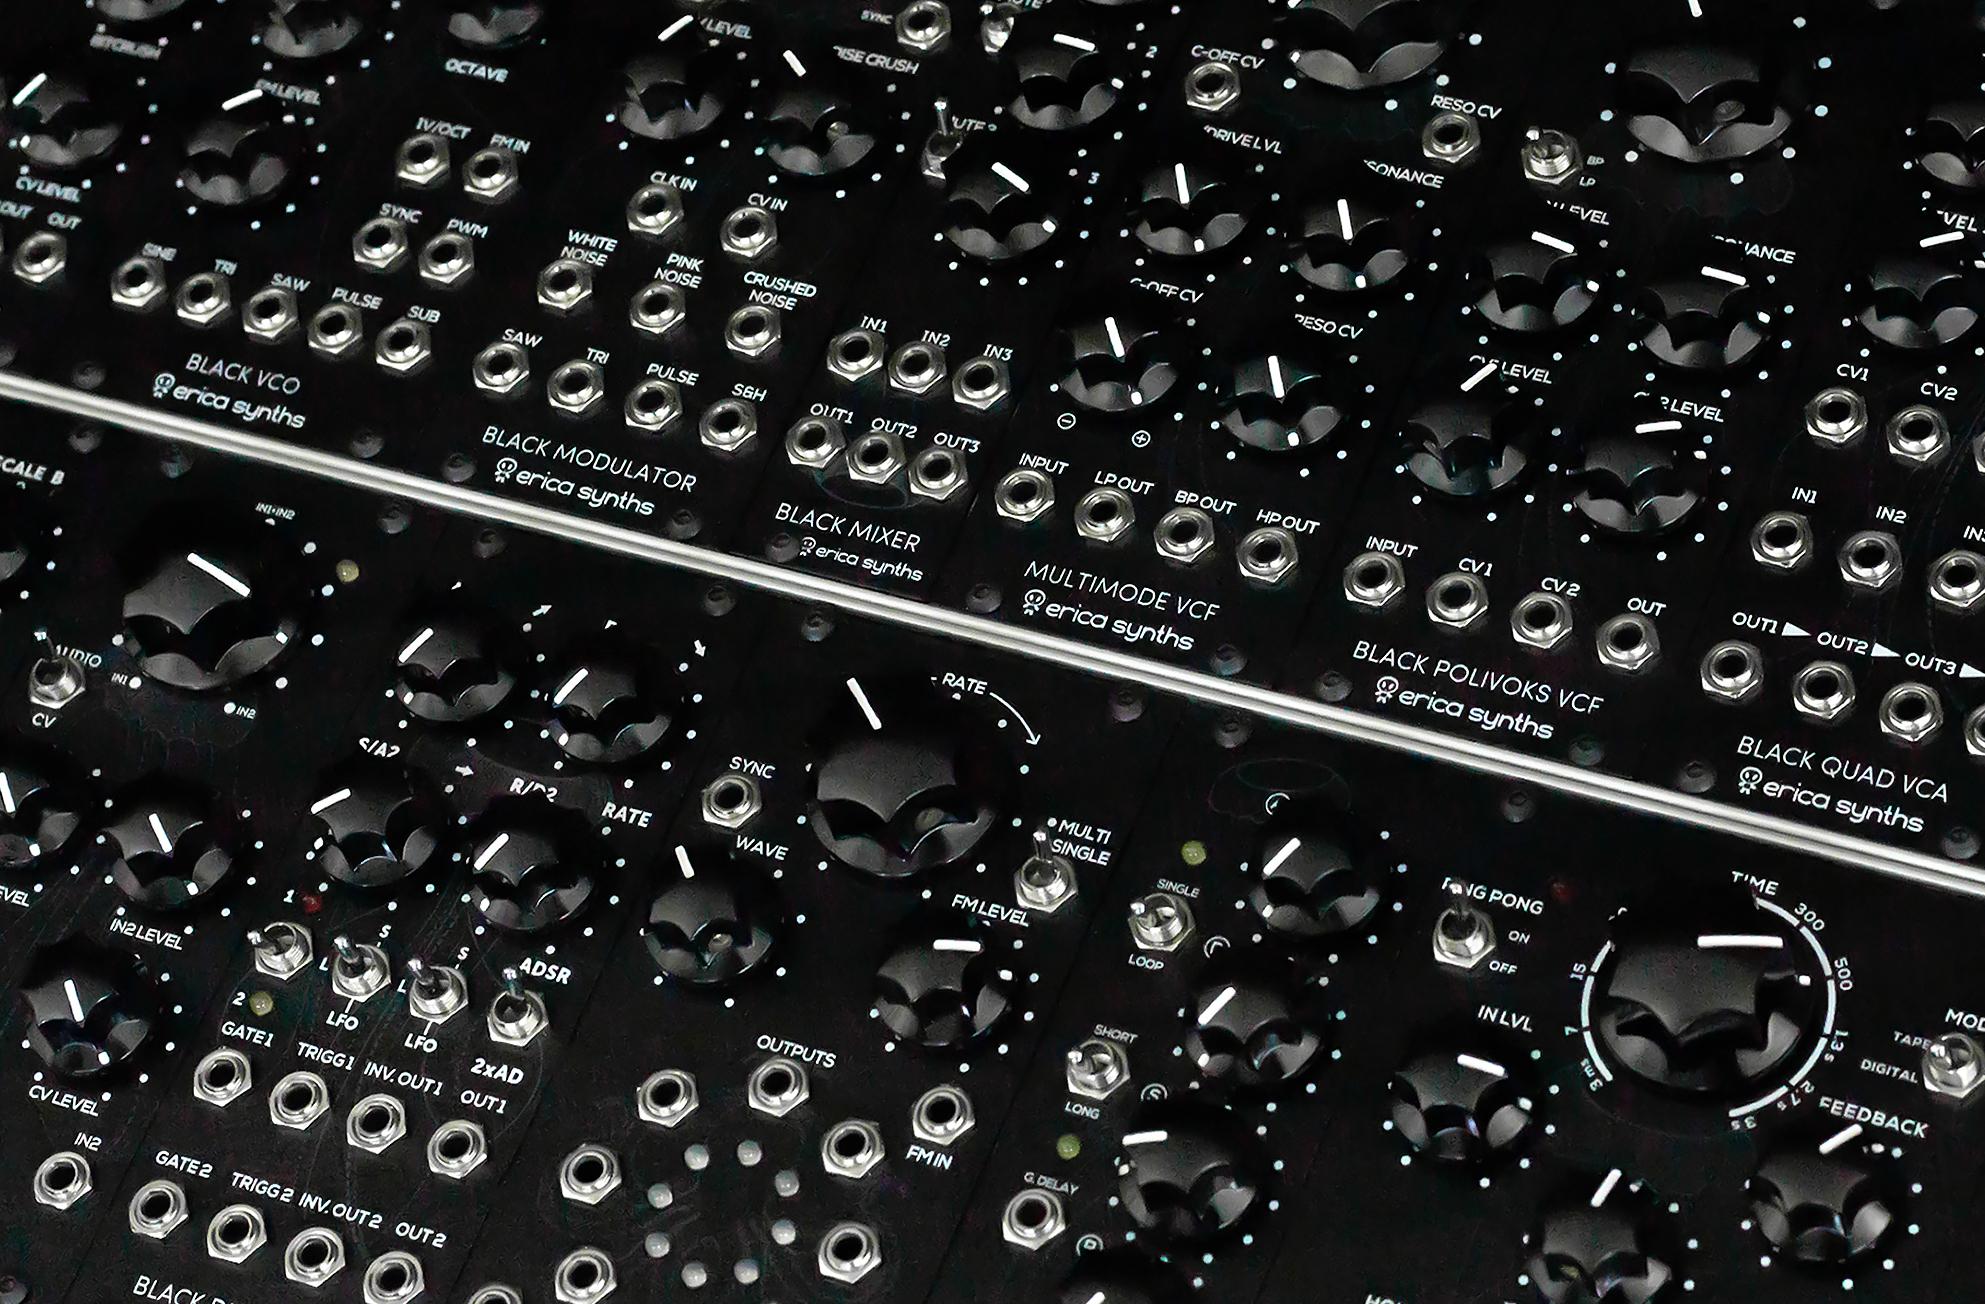 Erica Synths Black System II - Komplett Modular Synthesizer